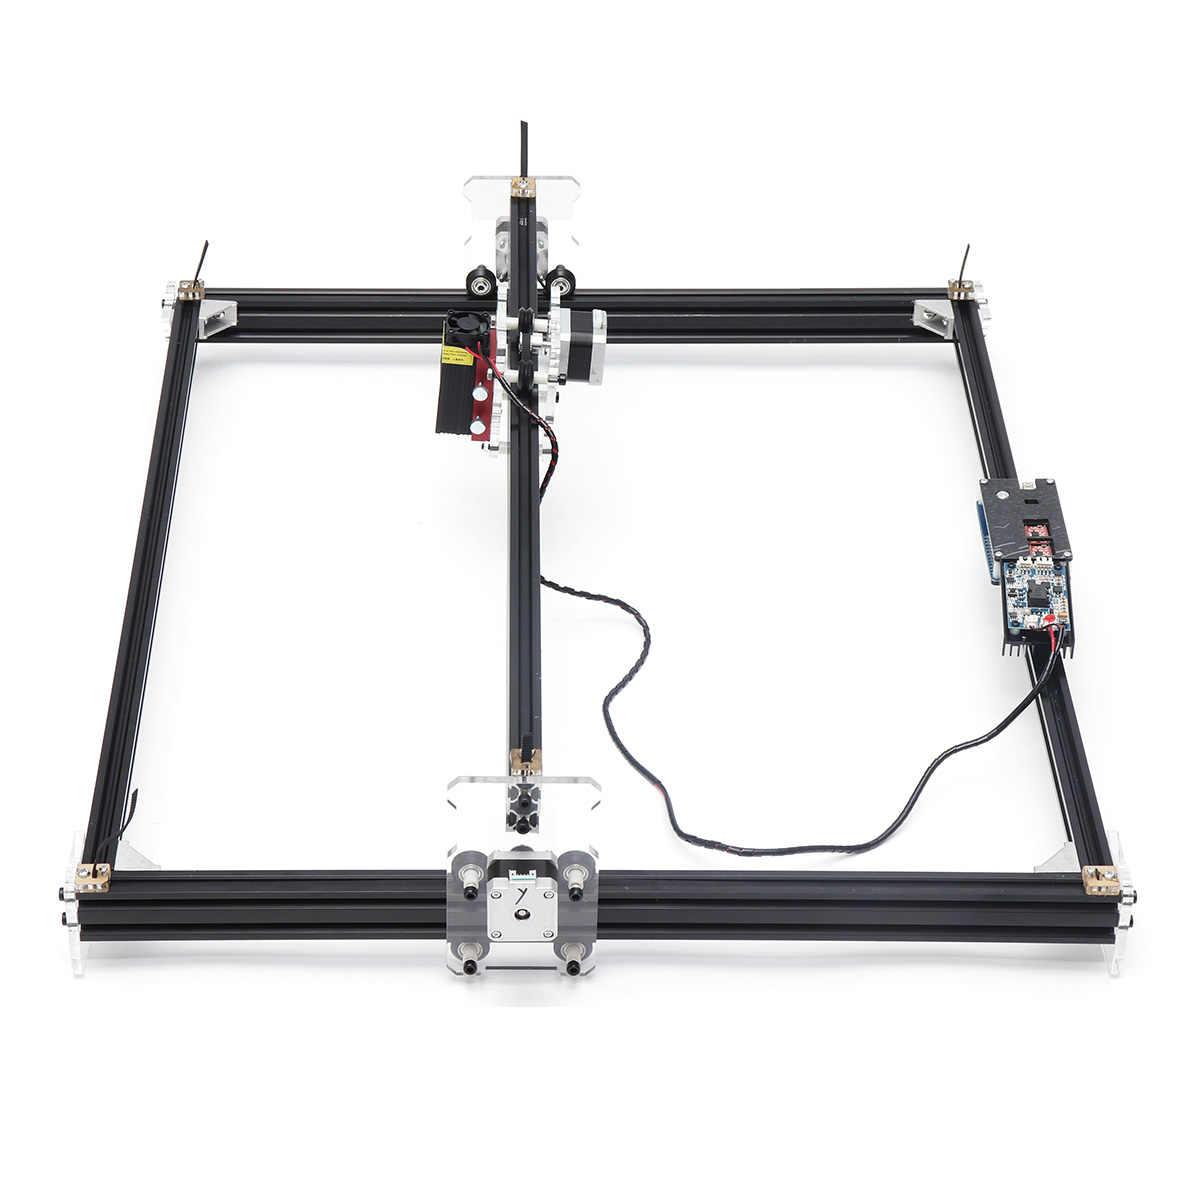 2500 mW profesional 65*50 cm de escritorio automático Mini CNC grabador láser cortador hogar bricolaje herramienta grabado corte de madera máquina de enrutador